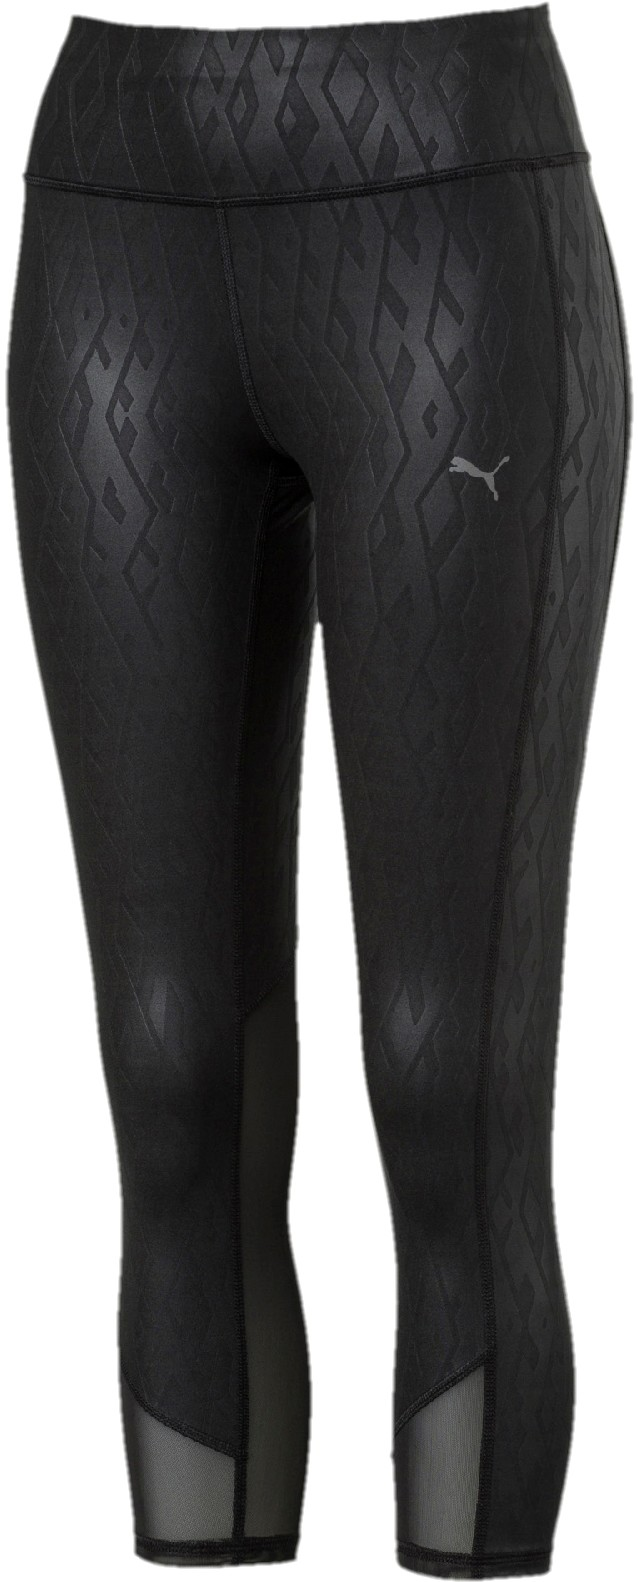 Puma Legginsy sportowe damskie Always On Graphic 3/4 Tight Black E XS